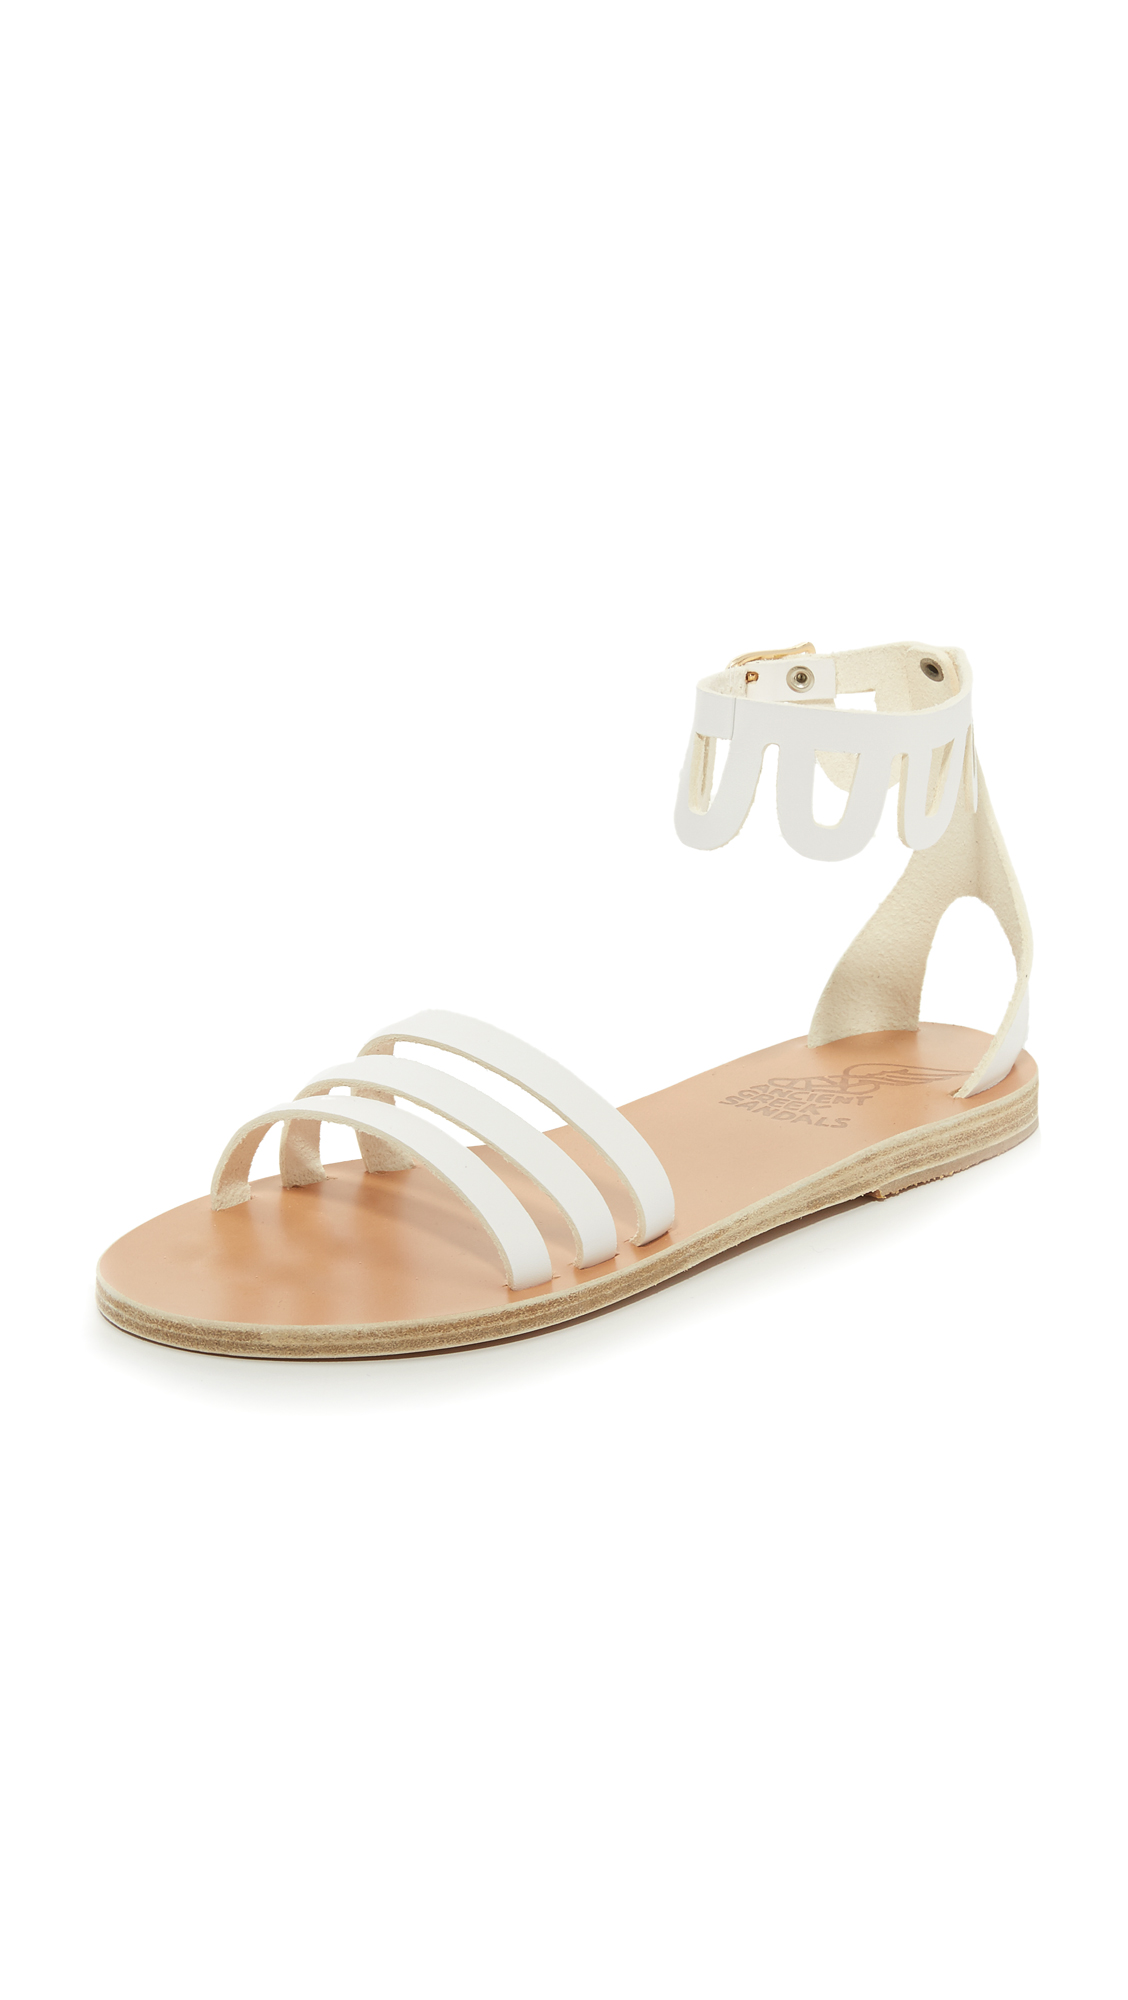 Ancient Greek Sandals Omorfi Sandals - White at Shopbop